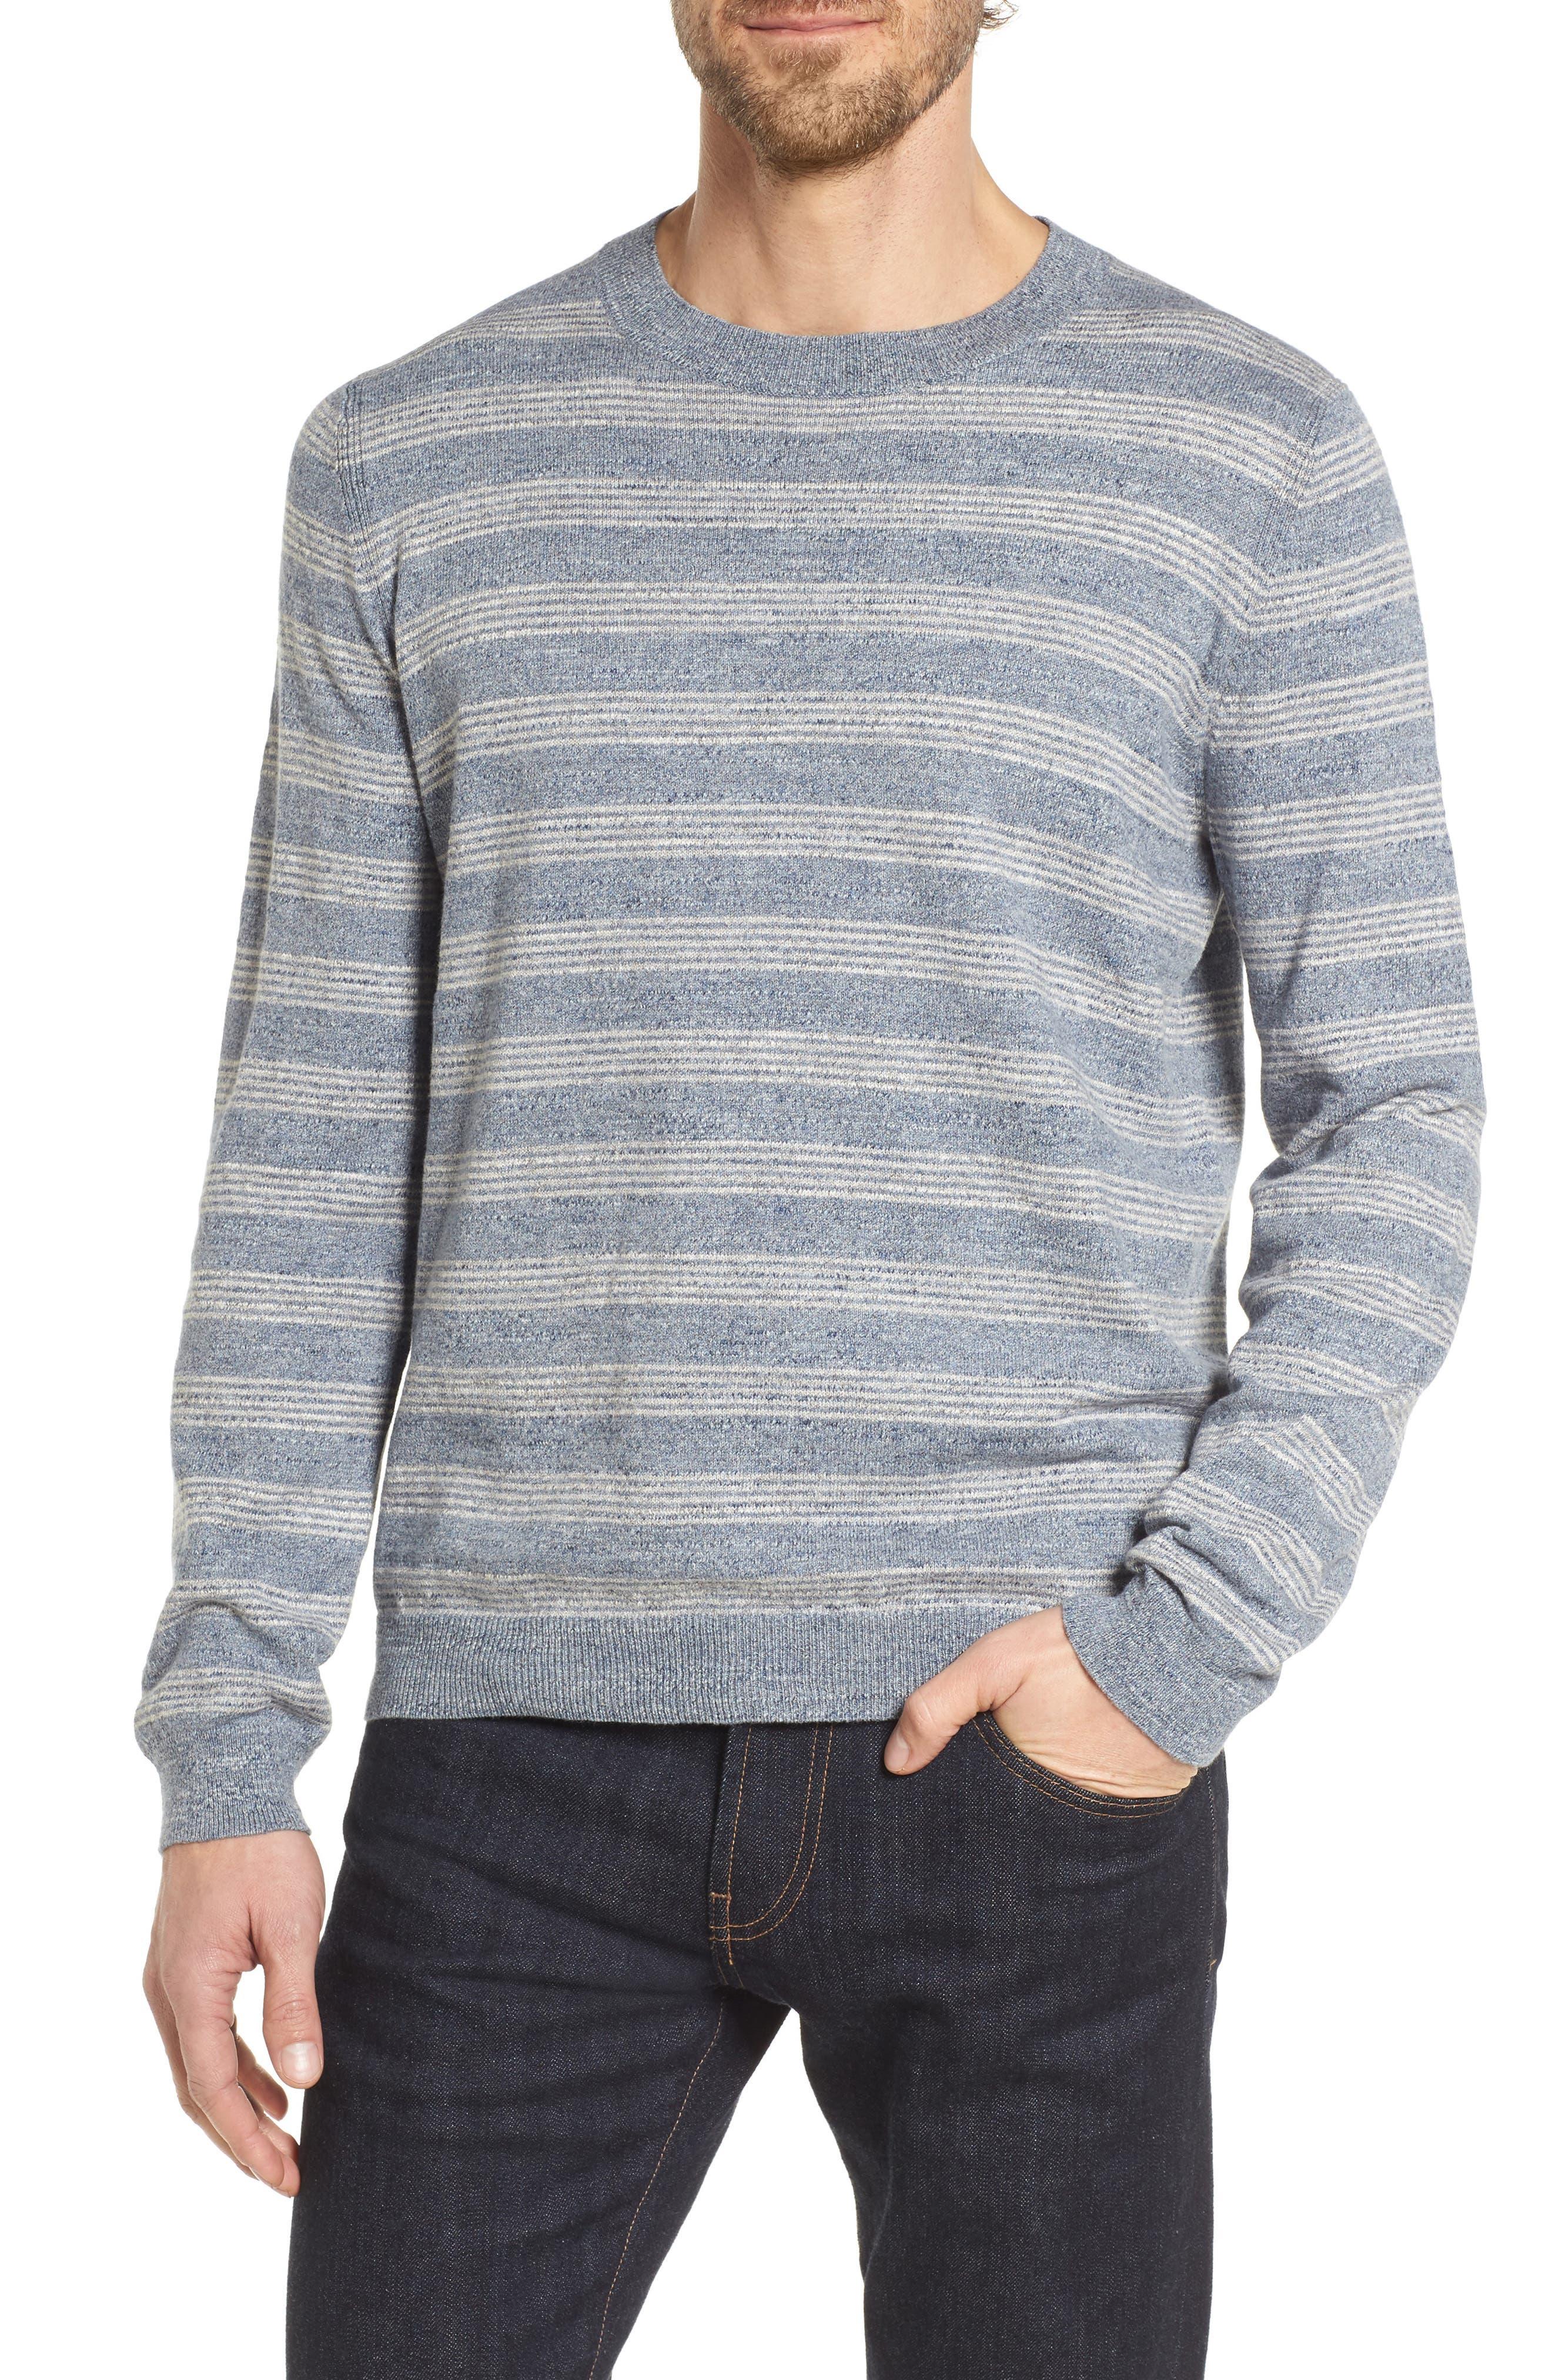 Stripe Cotton Sweater,                             Main thumbnail 1, color,                             Blue Grey Heather Stripe